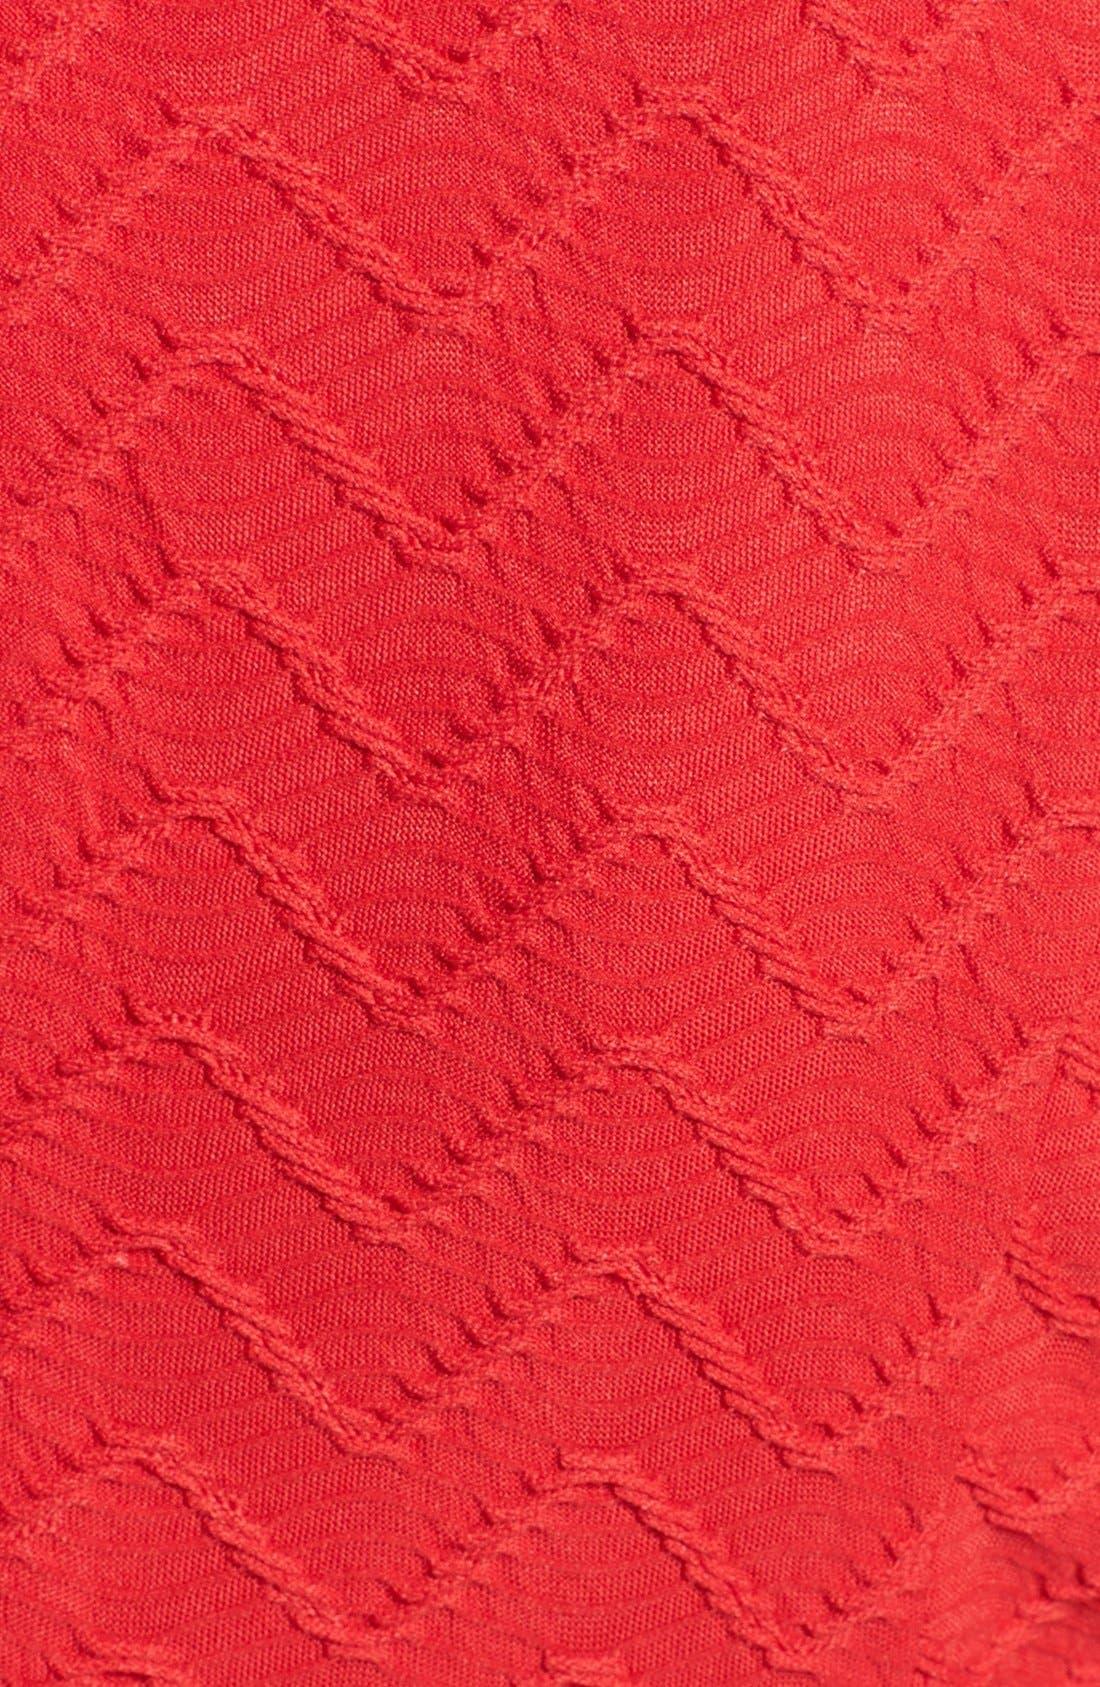 Alternate Image 4  - Eliza J Textured Knit Fit & Flare Dress (Petite)